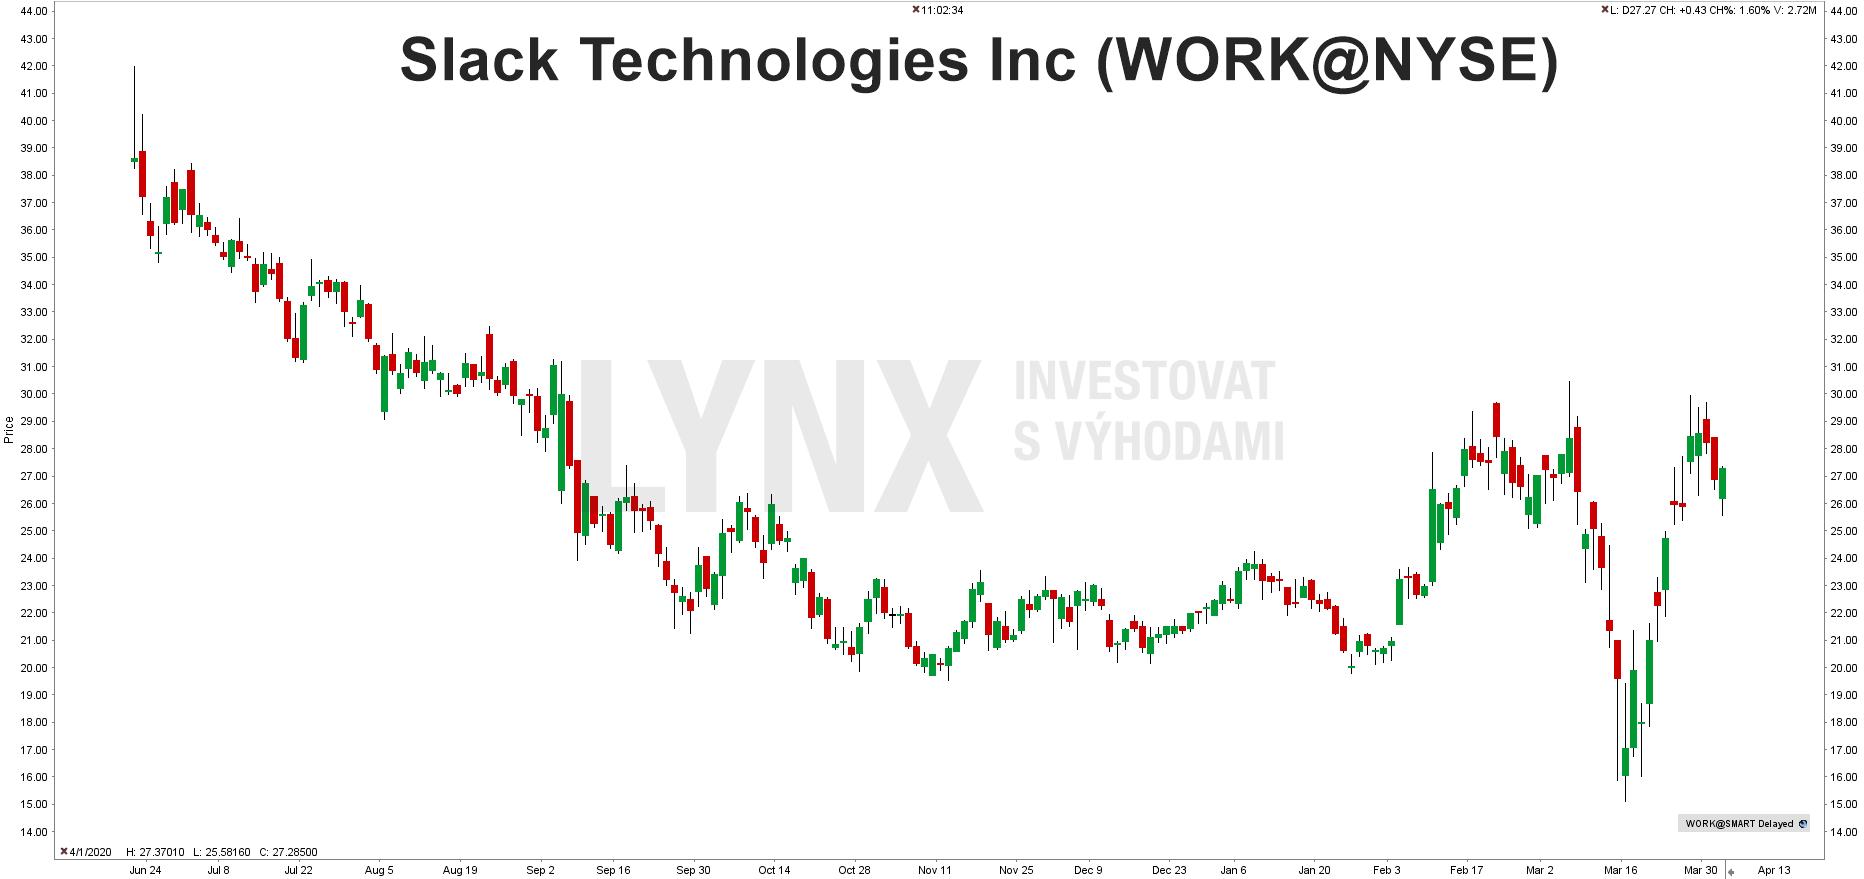 Graf akcie Slack